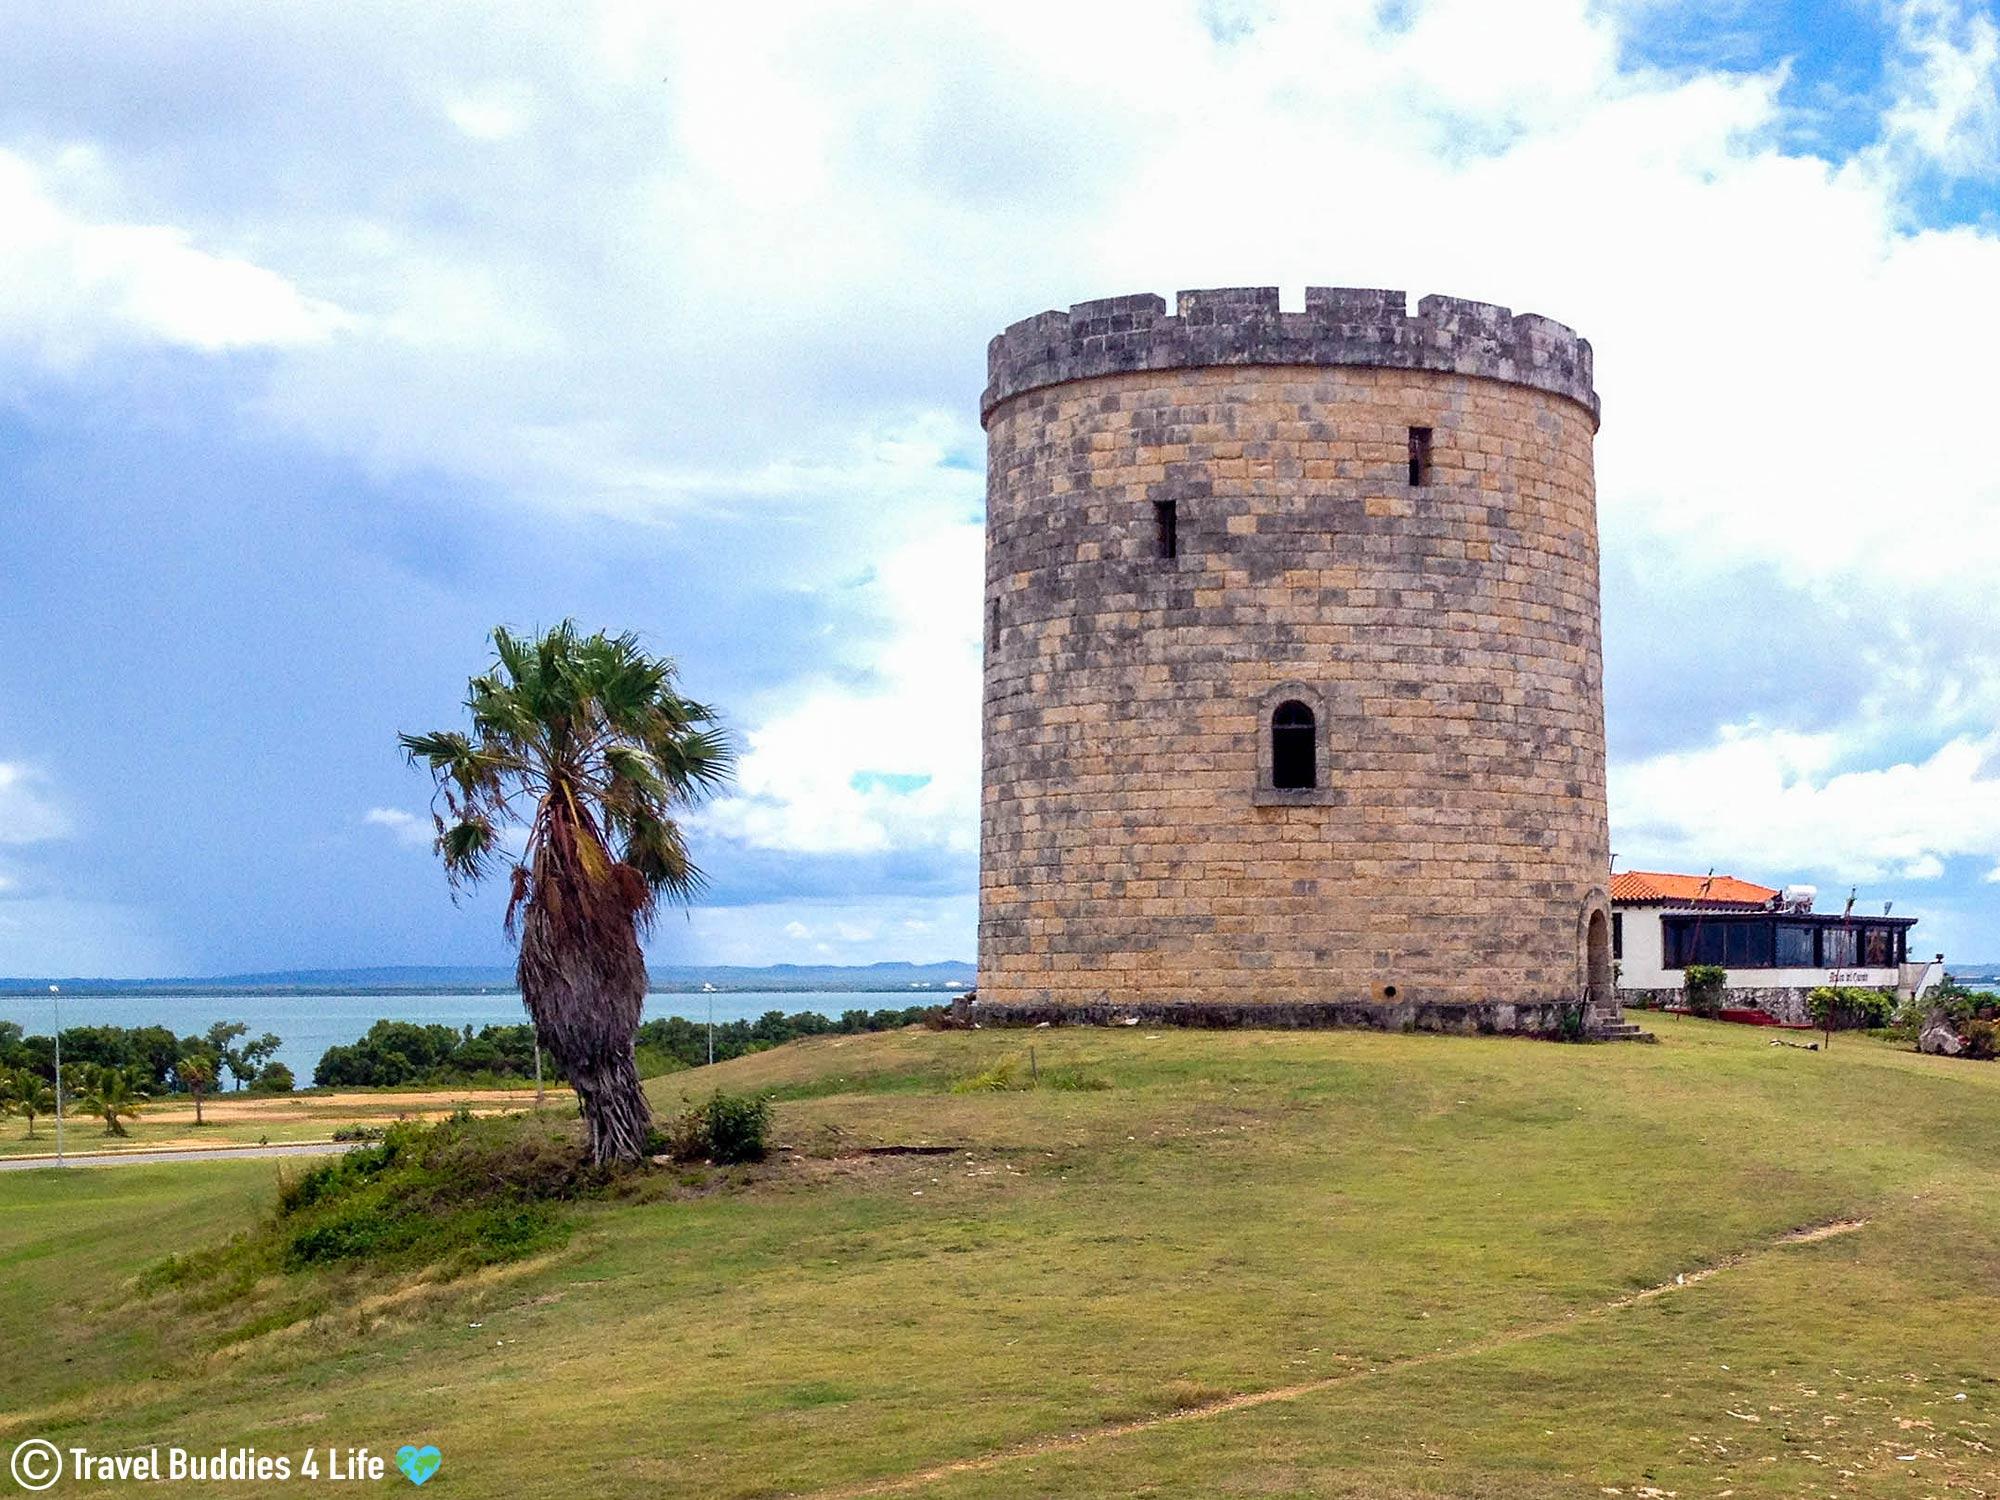 Cuban Castle Tower By The Ocean On The Varadero Peninsula, Cuba